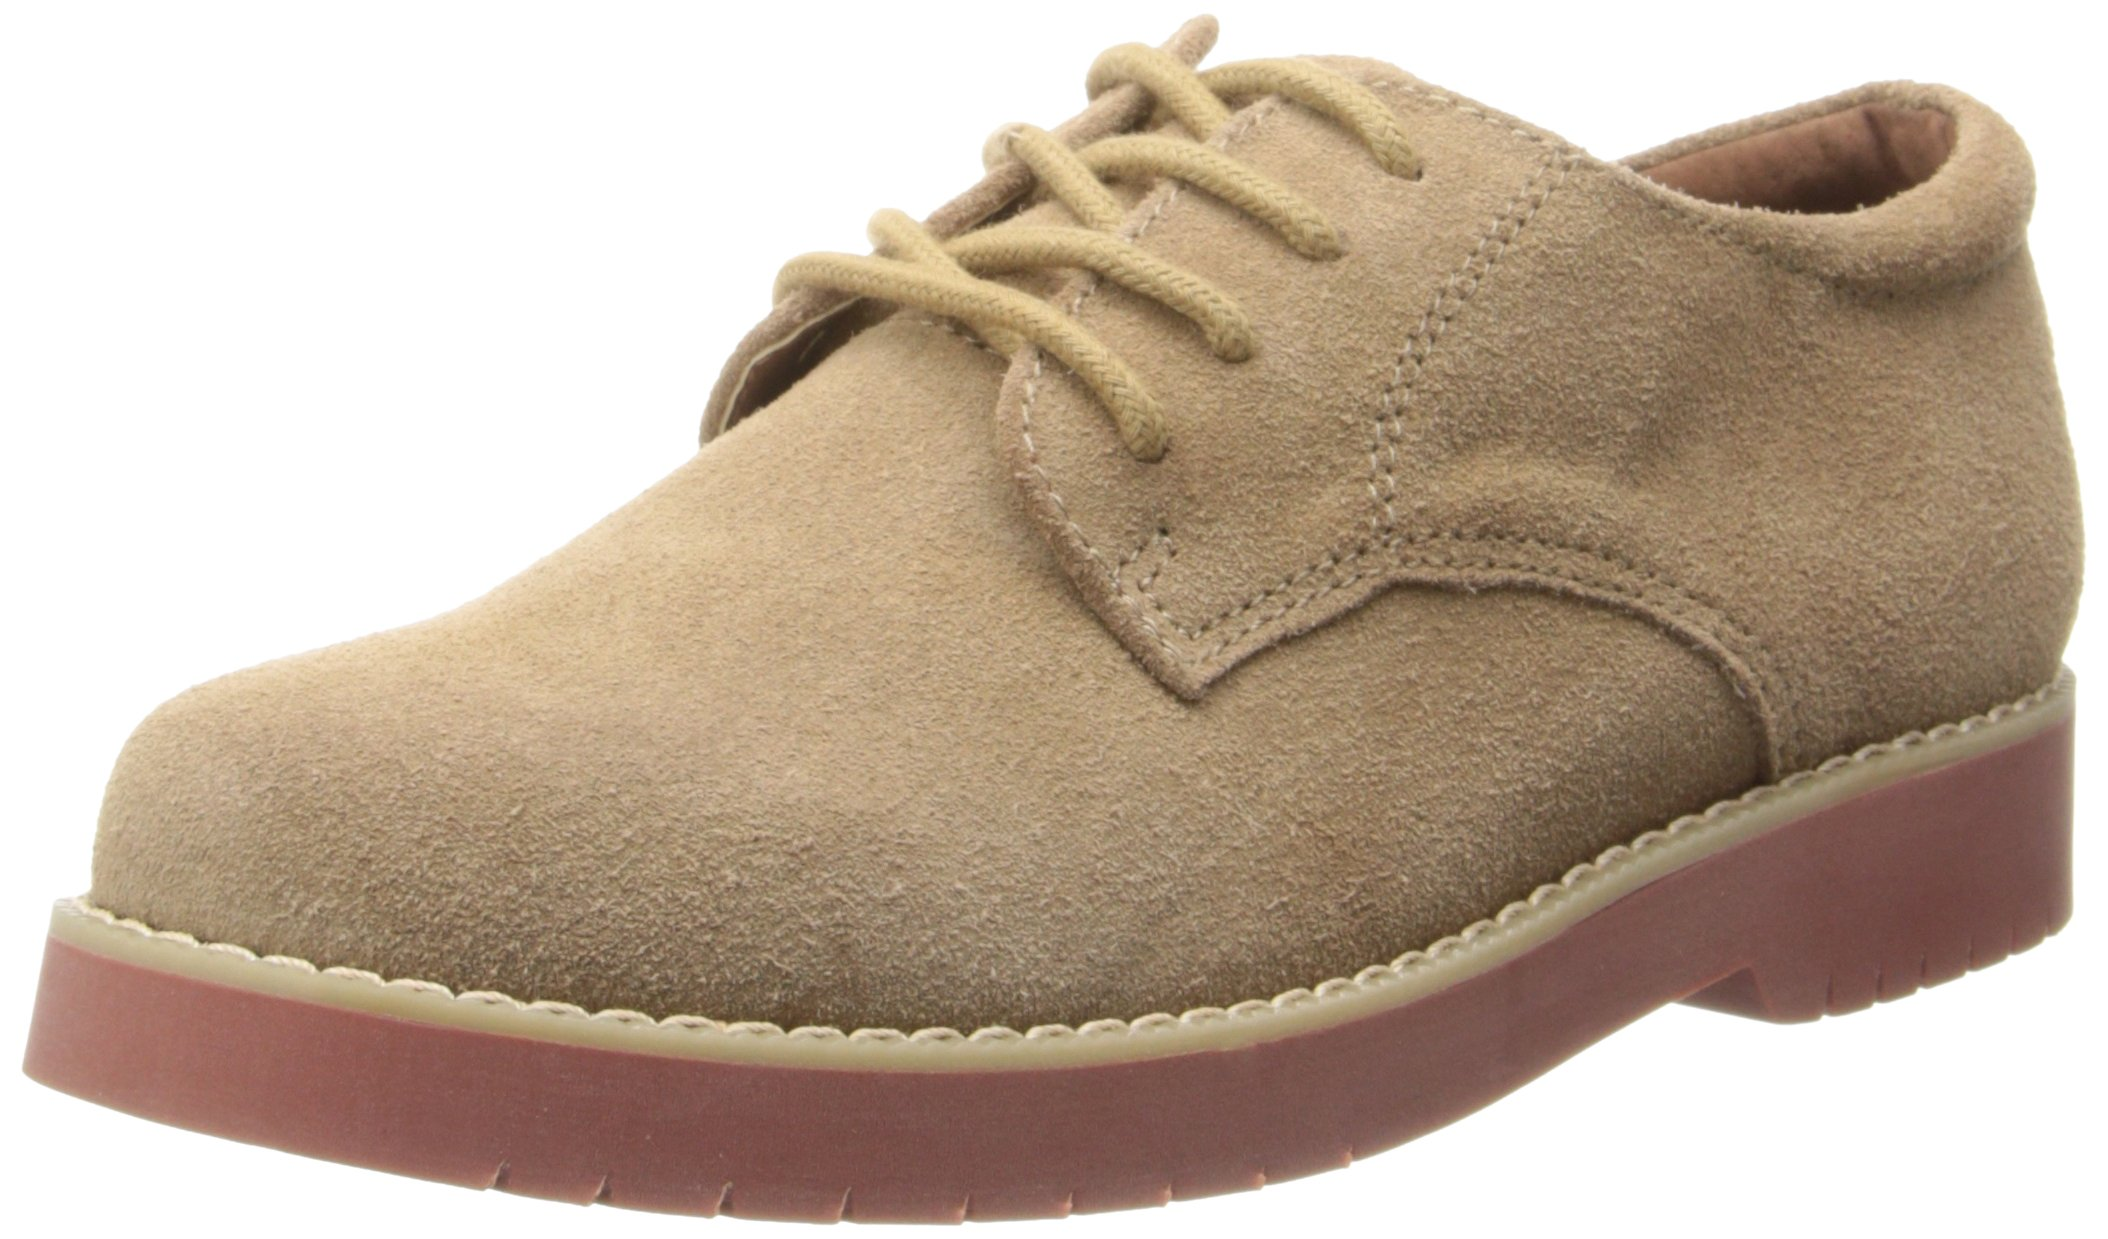 Academie Gear James School Shoe (Toddler/Little Kid/Big Kid),Dirty Buck,13 M US Little Kid